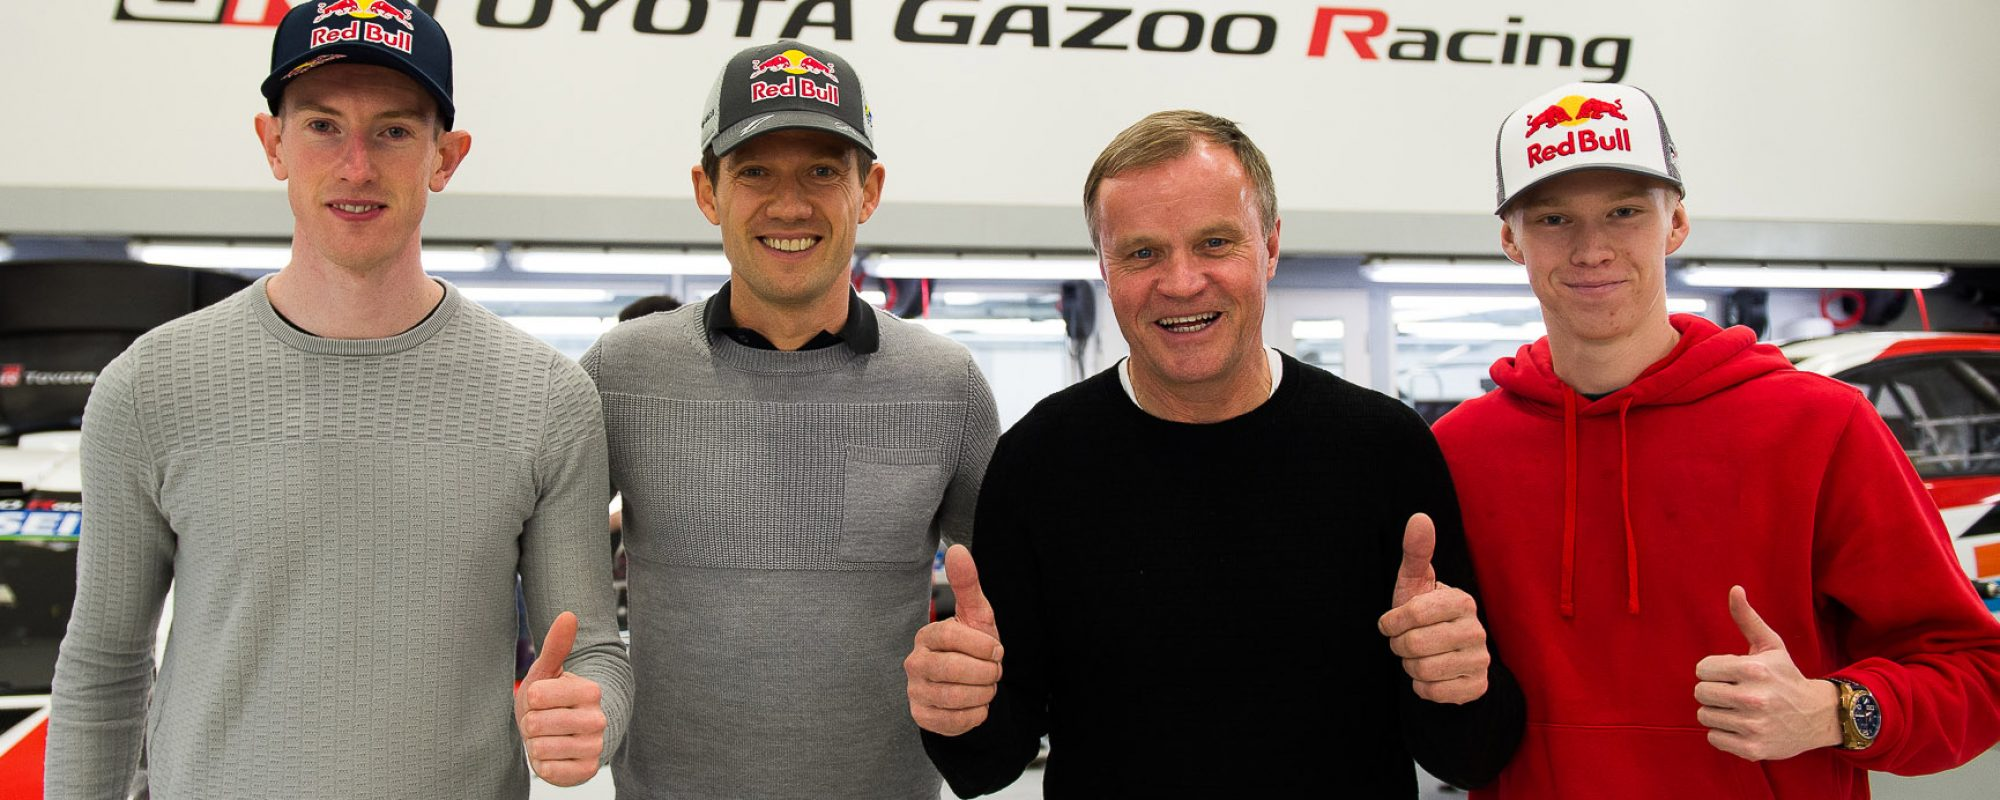 Toyota GAZOO Racing presenteert nieuwe WRC-coureurs